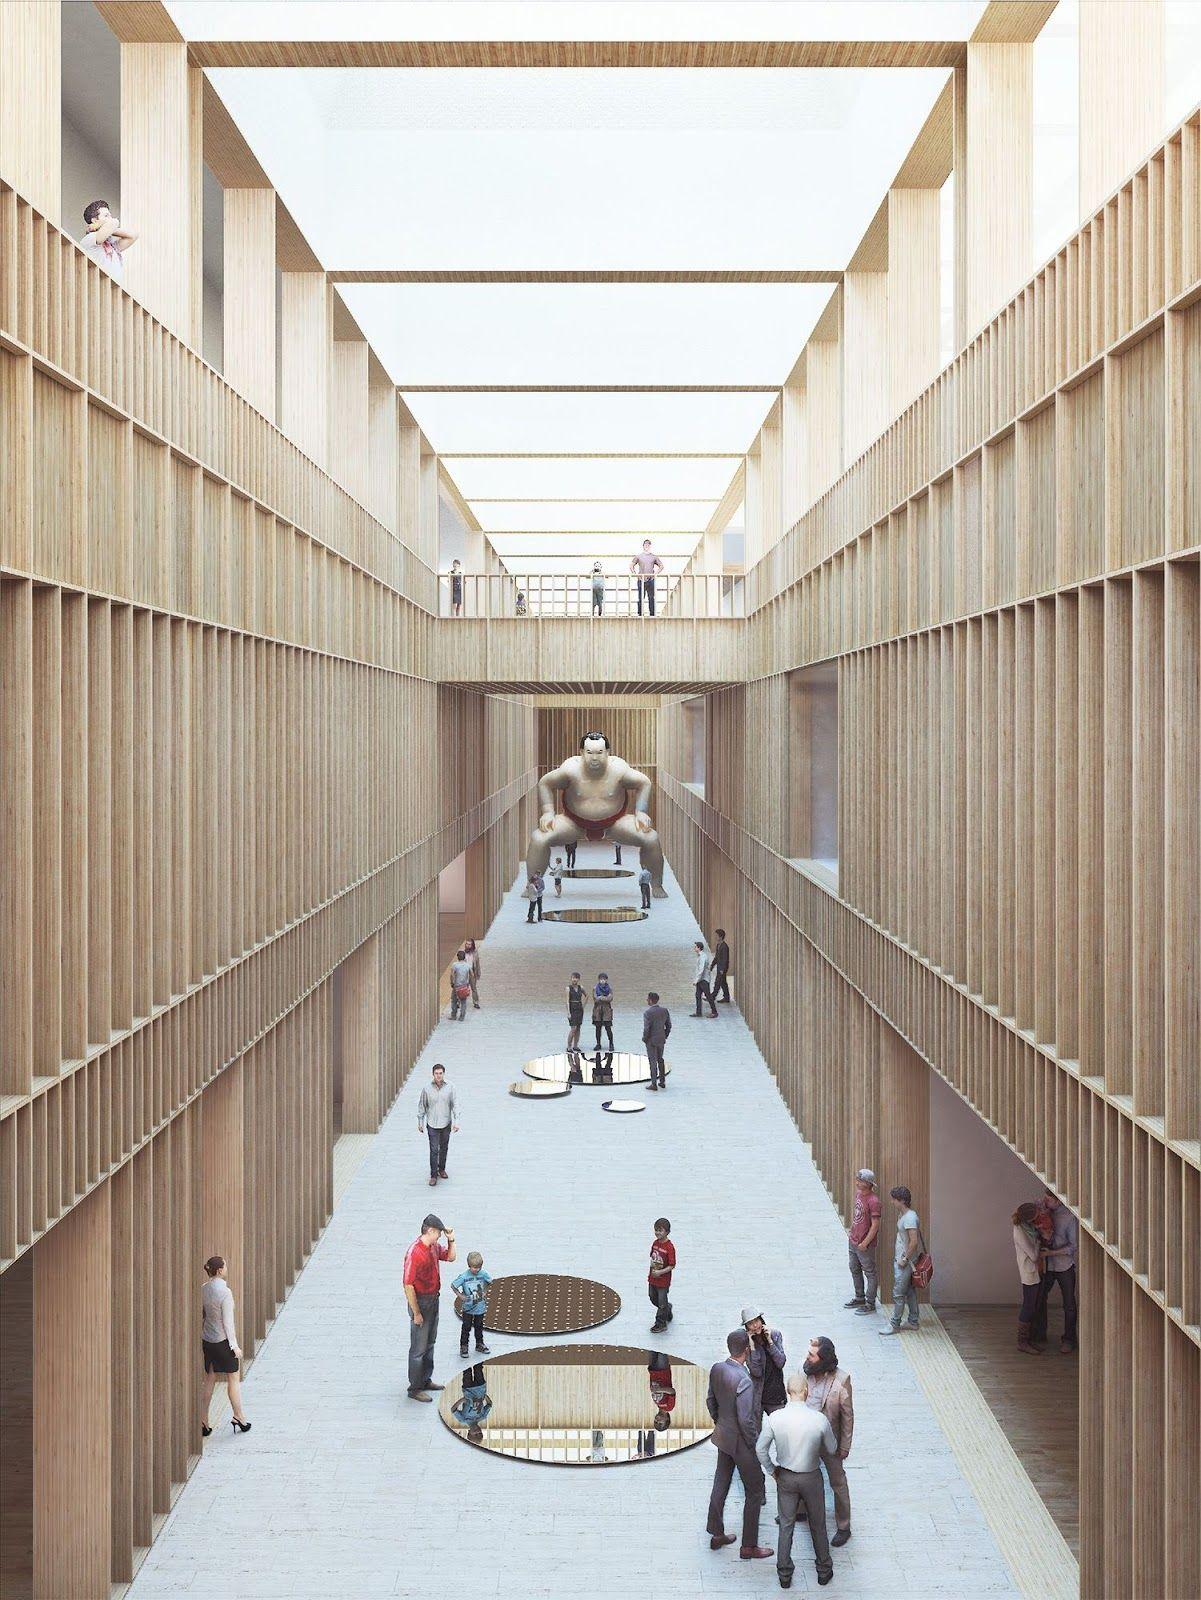 gallery interior, realist visualization